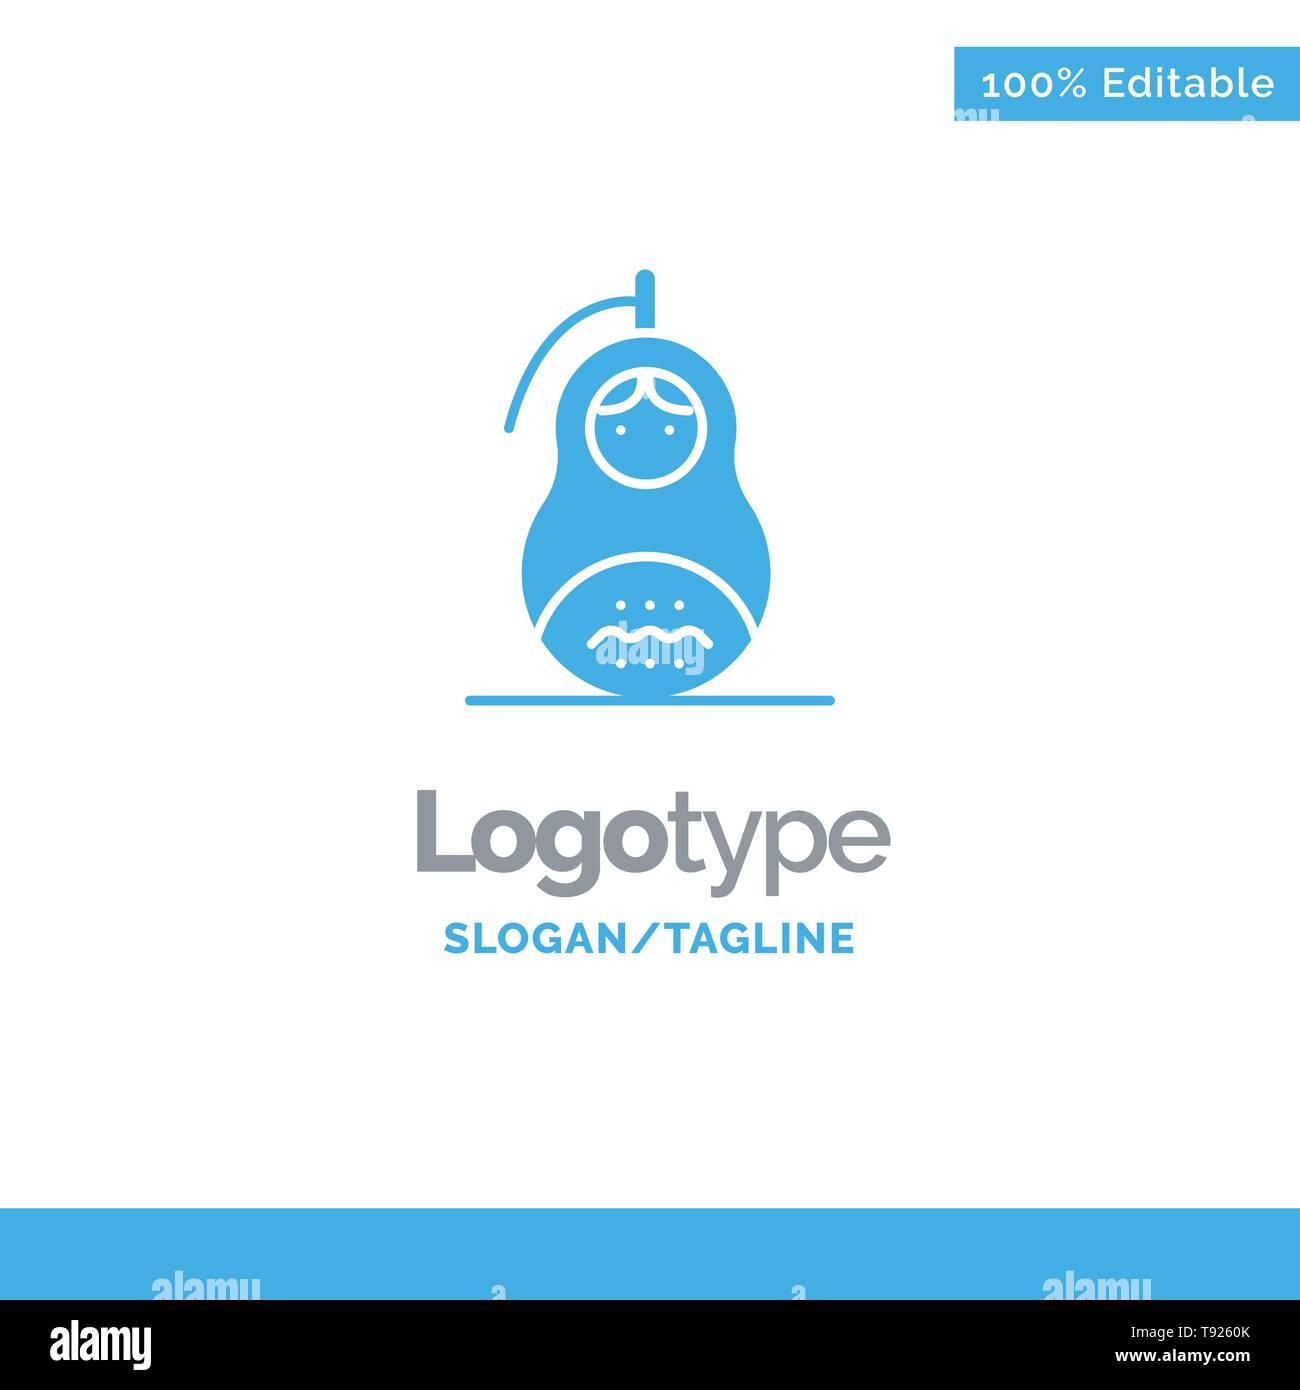 Fraud, Grenade, Matrioshka, Peace, Russia Blue Solid Logo Template. Place for Tagline - Stock Vector